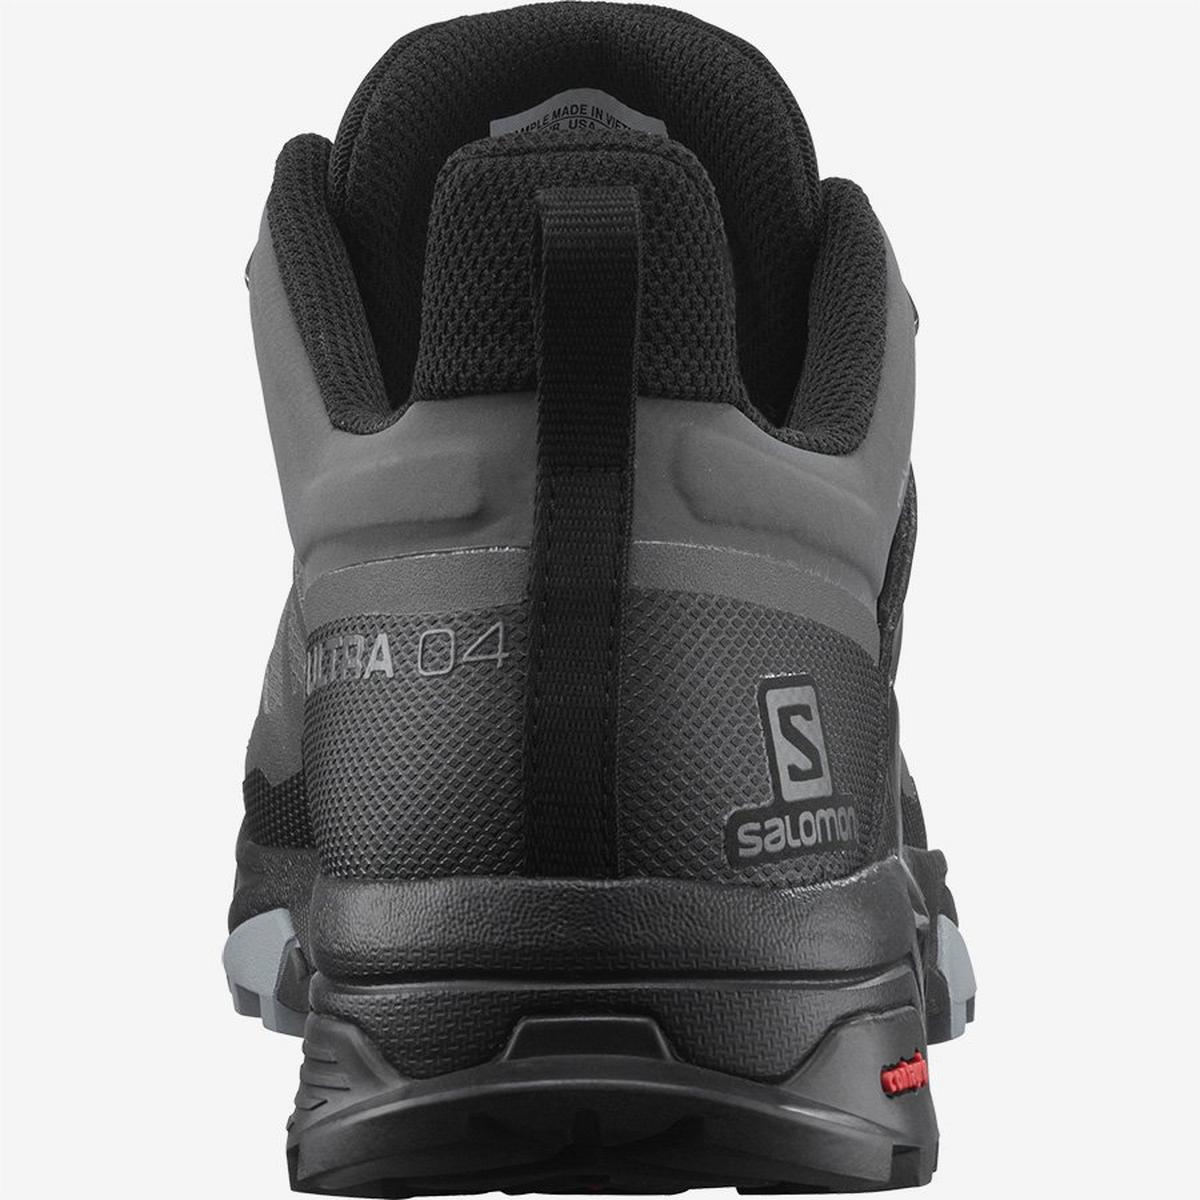 Salomon Men's X Ultra 4 GTX - Magnet Black